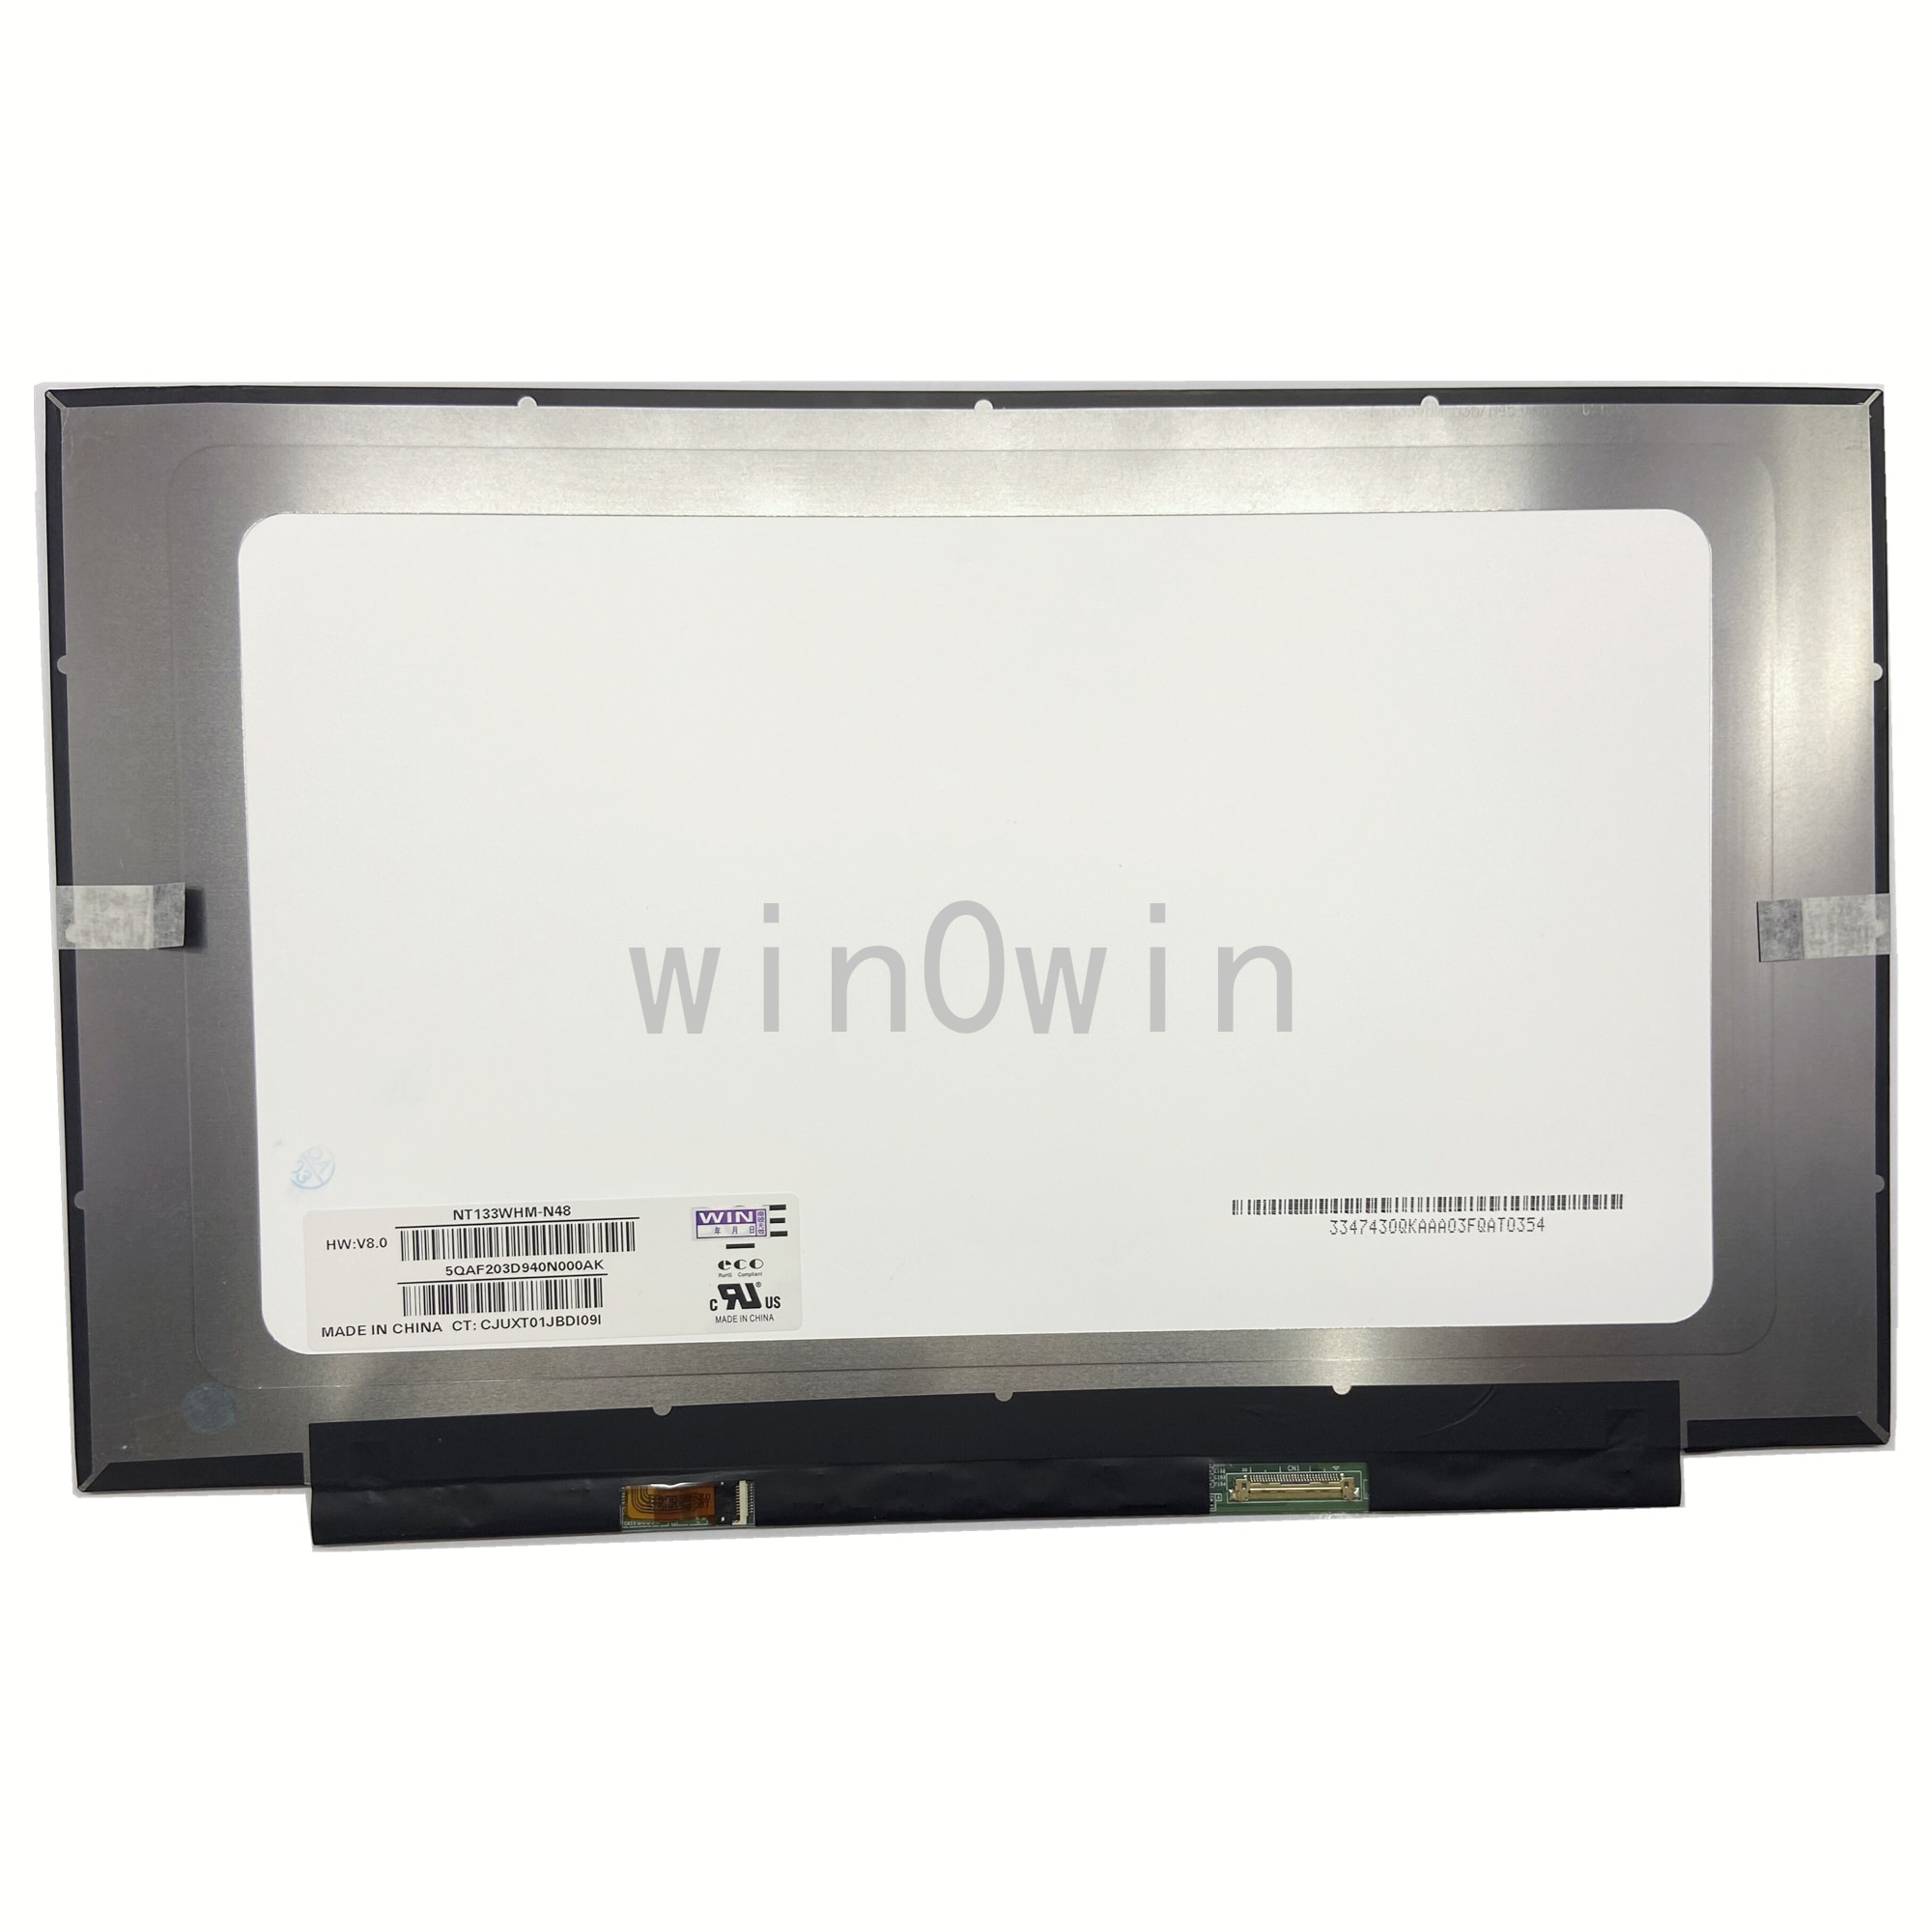 NT133WHM-N48 صالح NT133WHM-N47 B133XTN03.2 B133XTN03.3 M133NWR9 R1 N133BGA-EA2